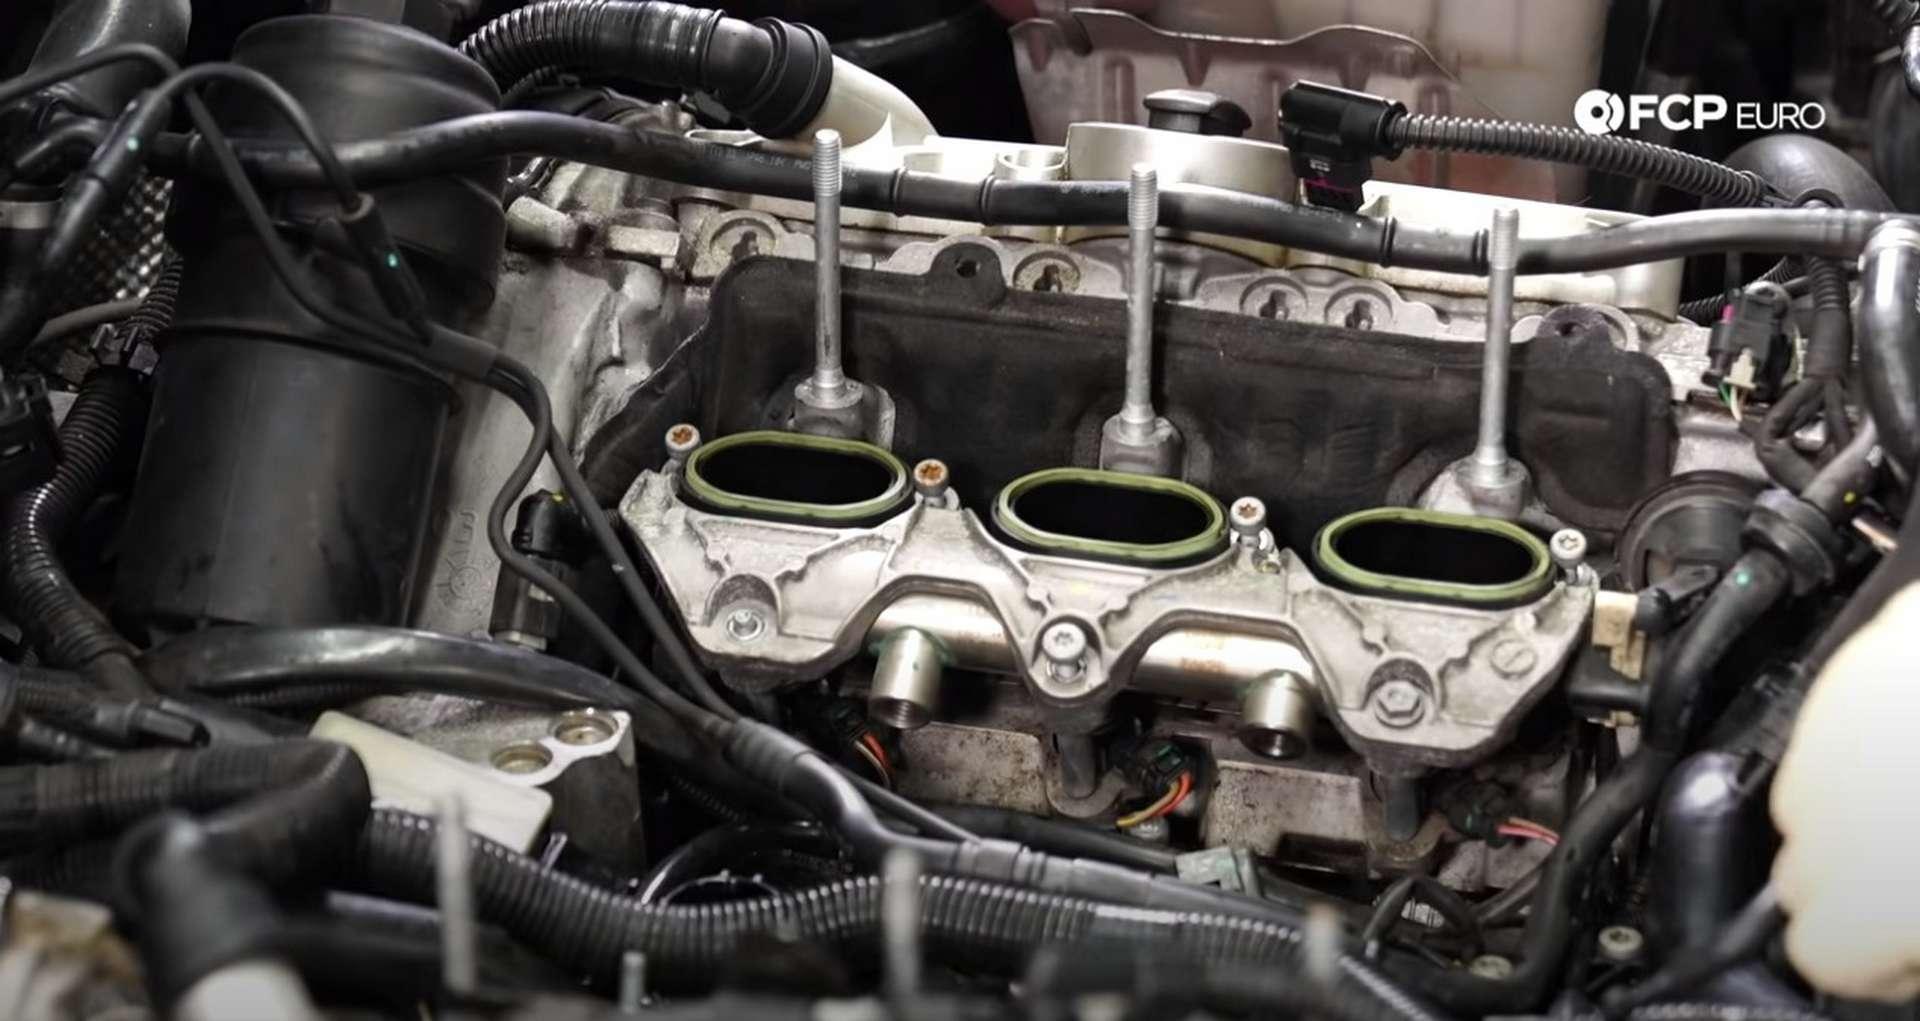 DIY Audi 3.0t Walnut Blasting Intake Valves installing the manifold/tumble flap housing